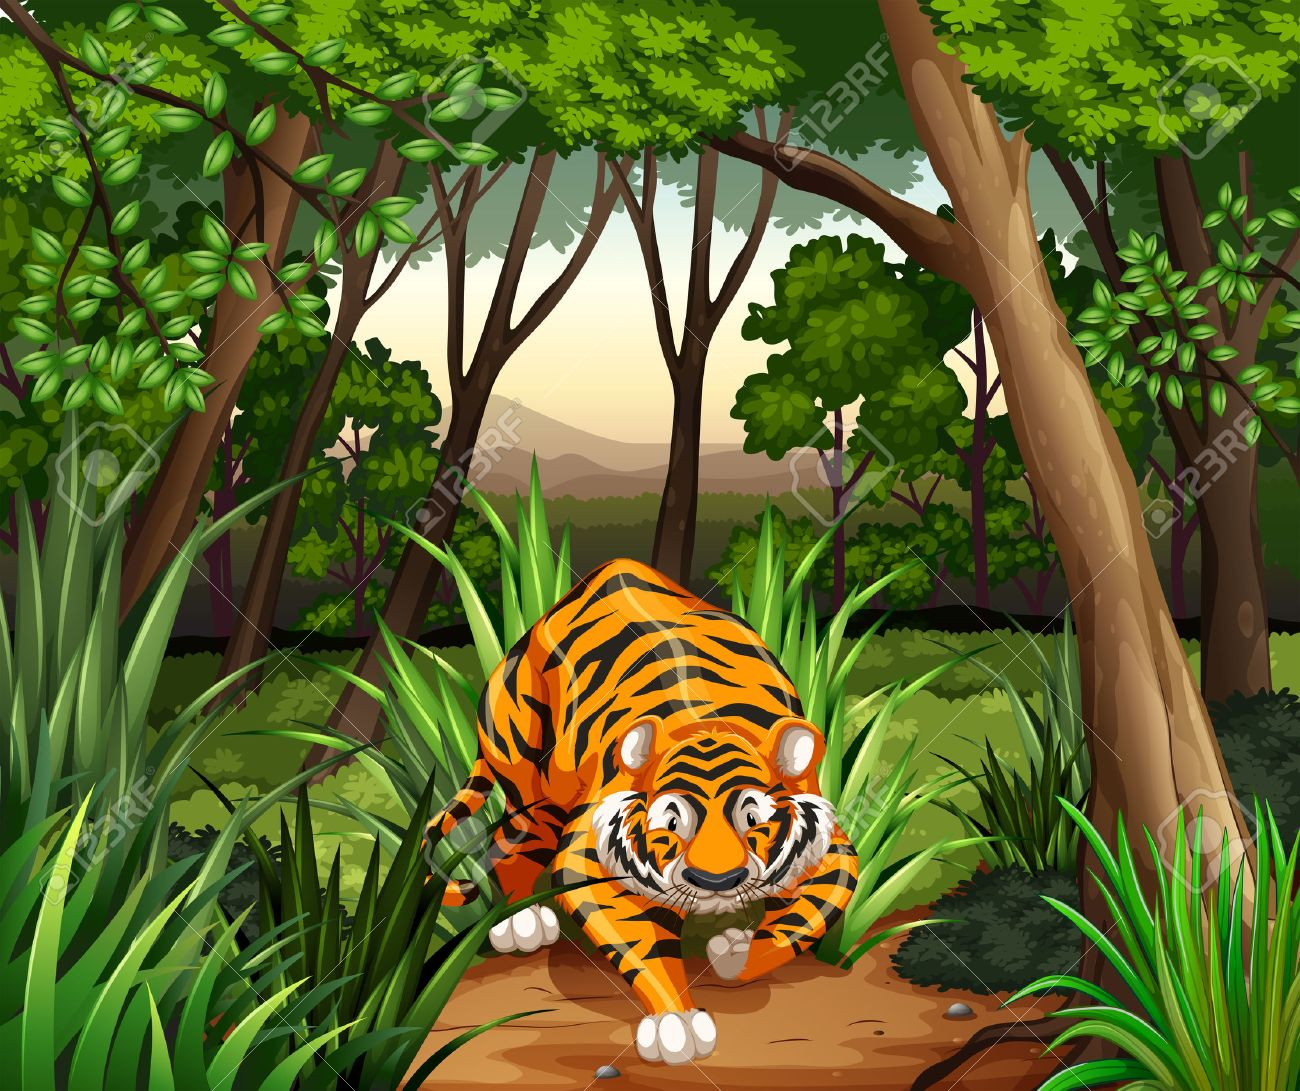 Tiger walking in a jungle - 40400232